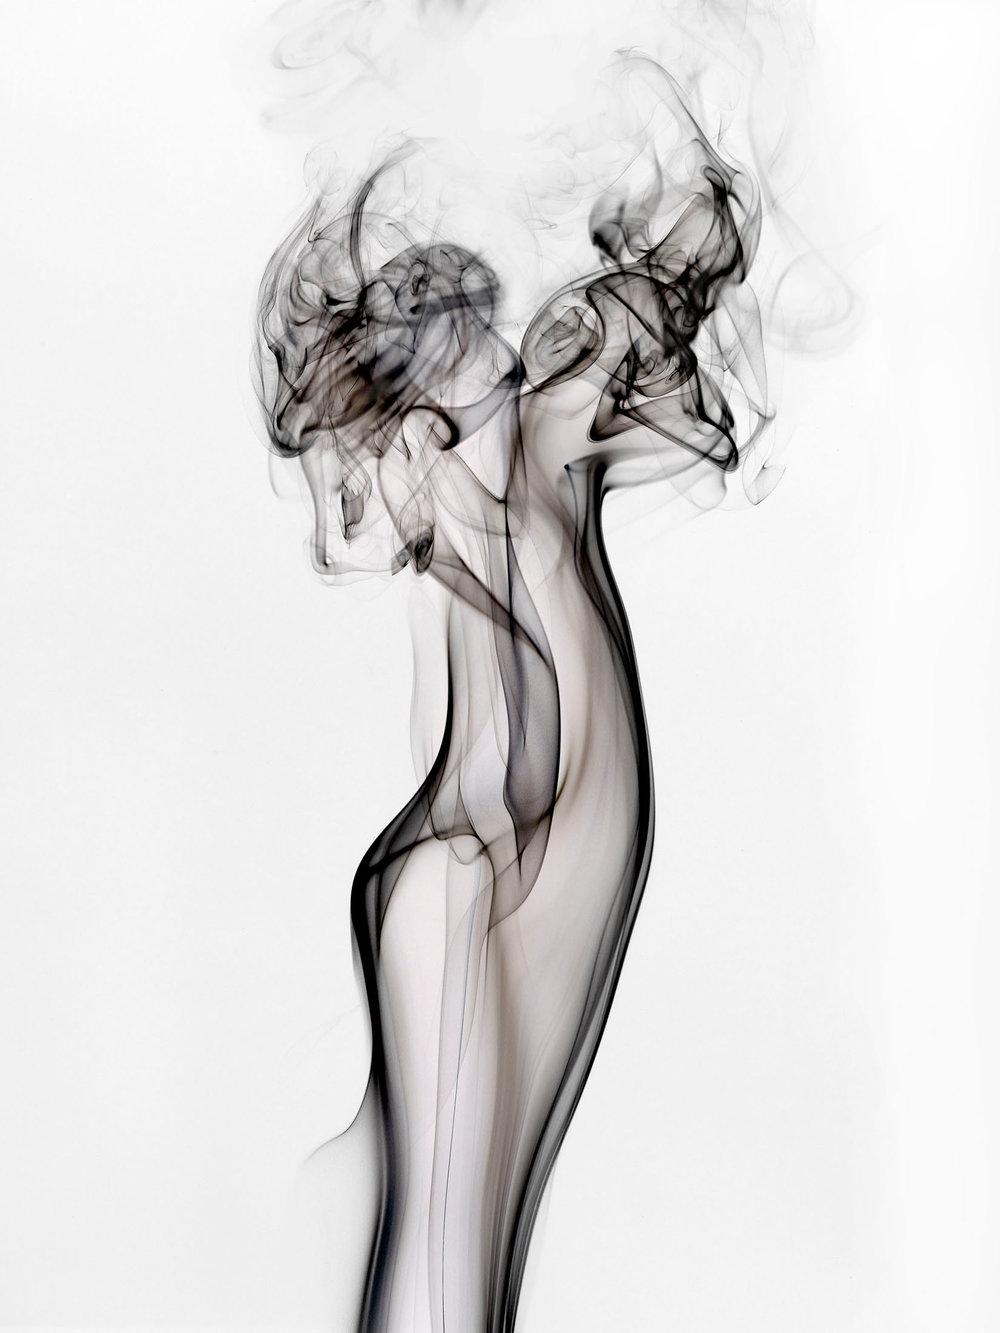 Shai Kremer,  Perception #5 (white) , 2017 Archival pigment print, Edition of 7+2AP, 40x30 inches